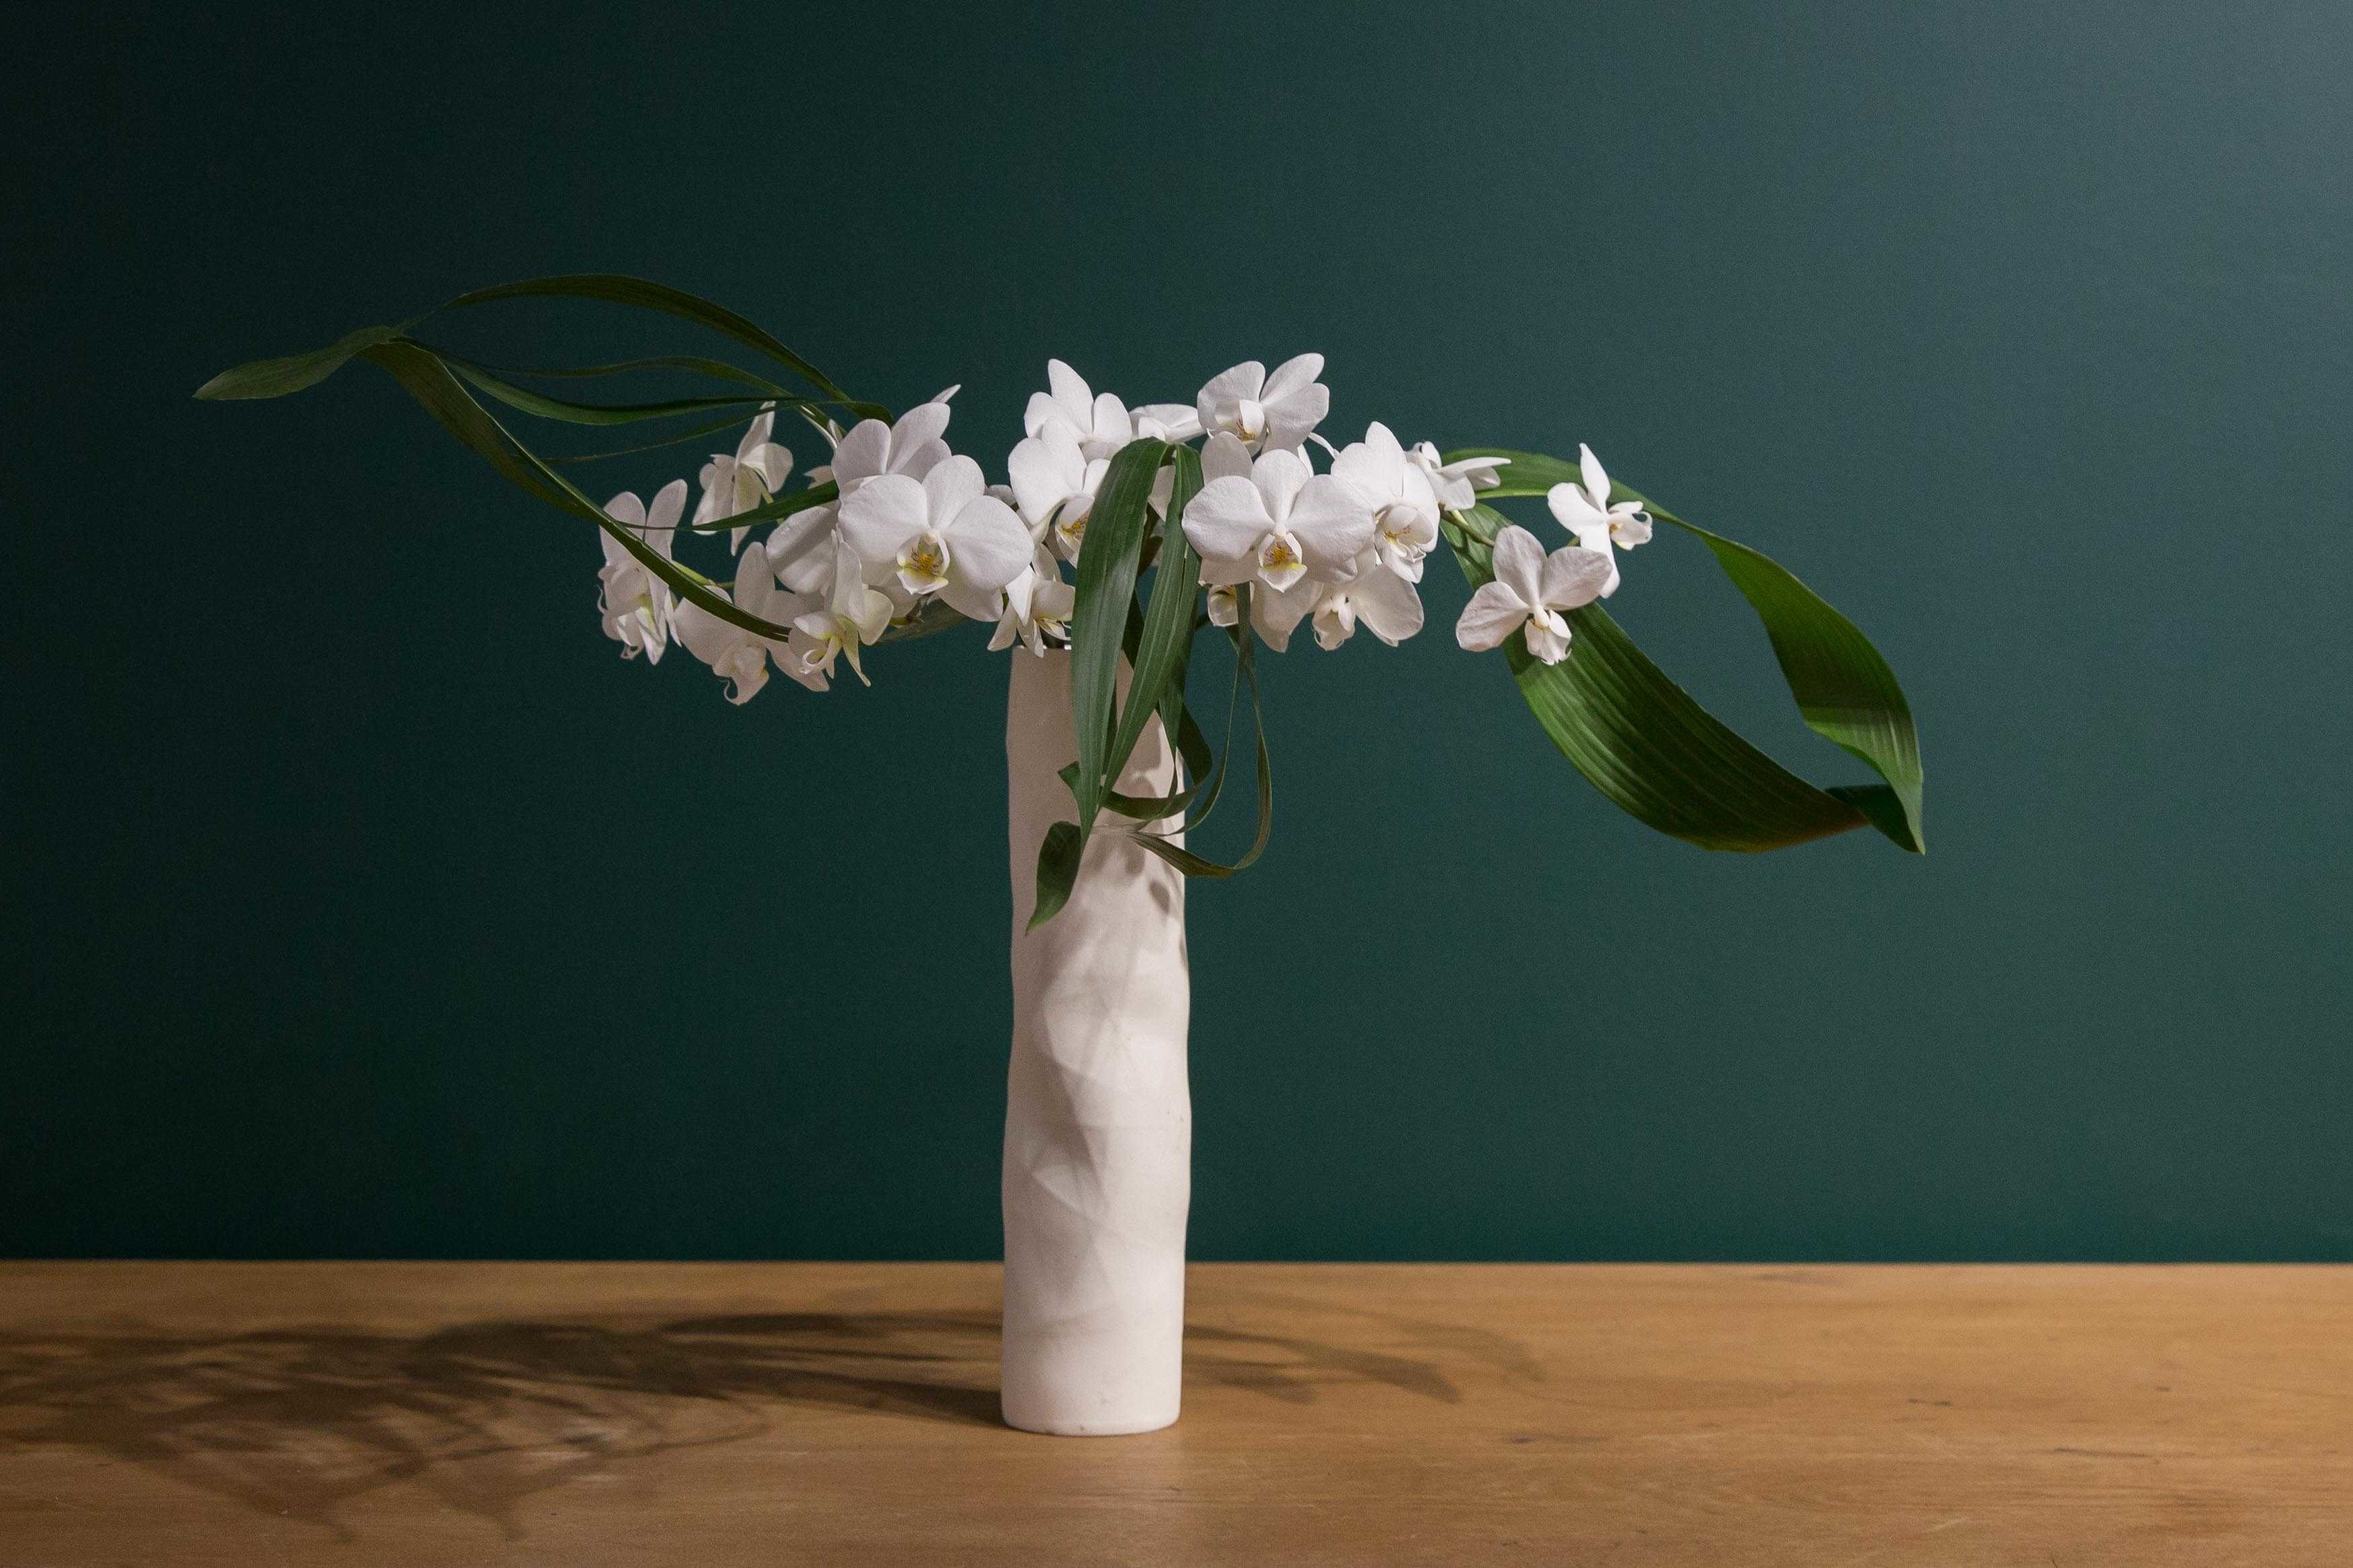 Ikebana_arrangement_by_Mr_Suga